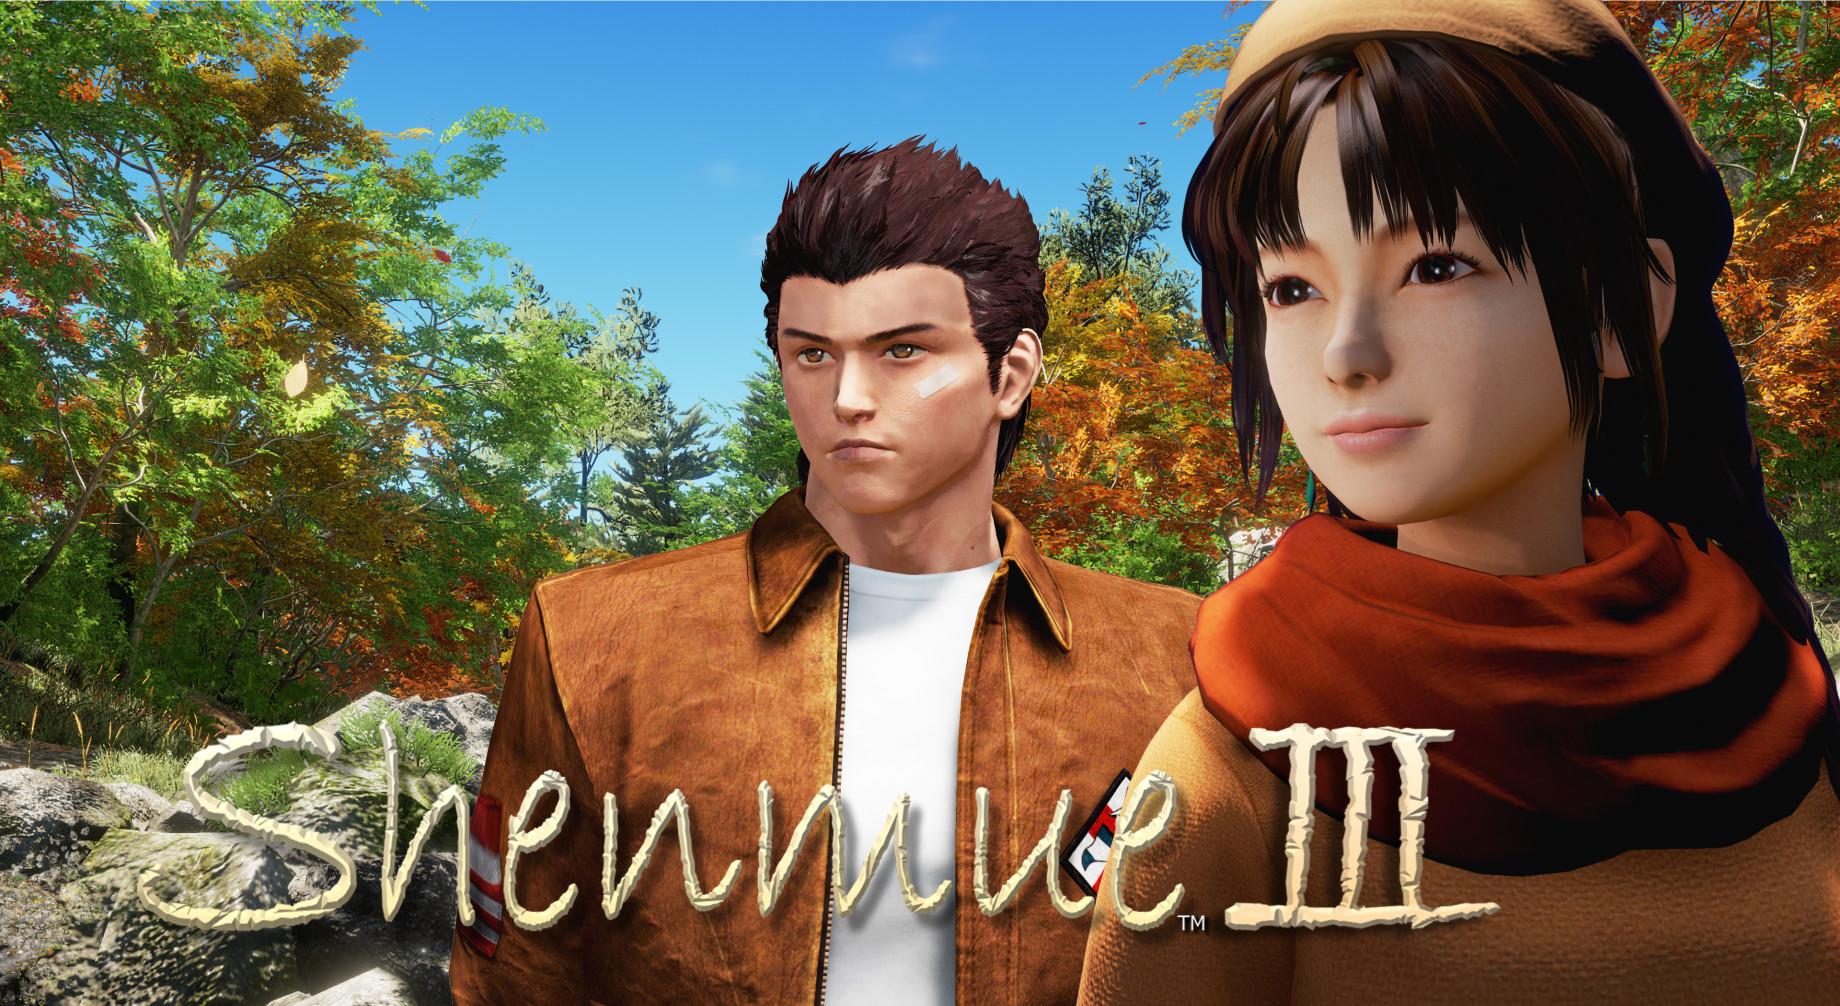 shenmue-3-kickstarter-ps4-pc